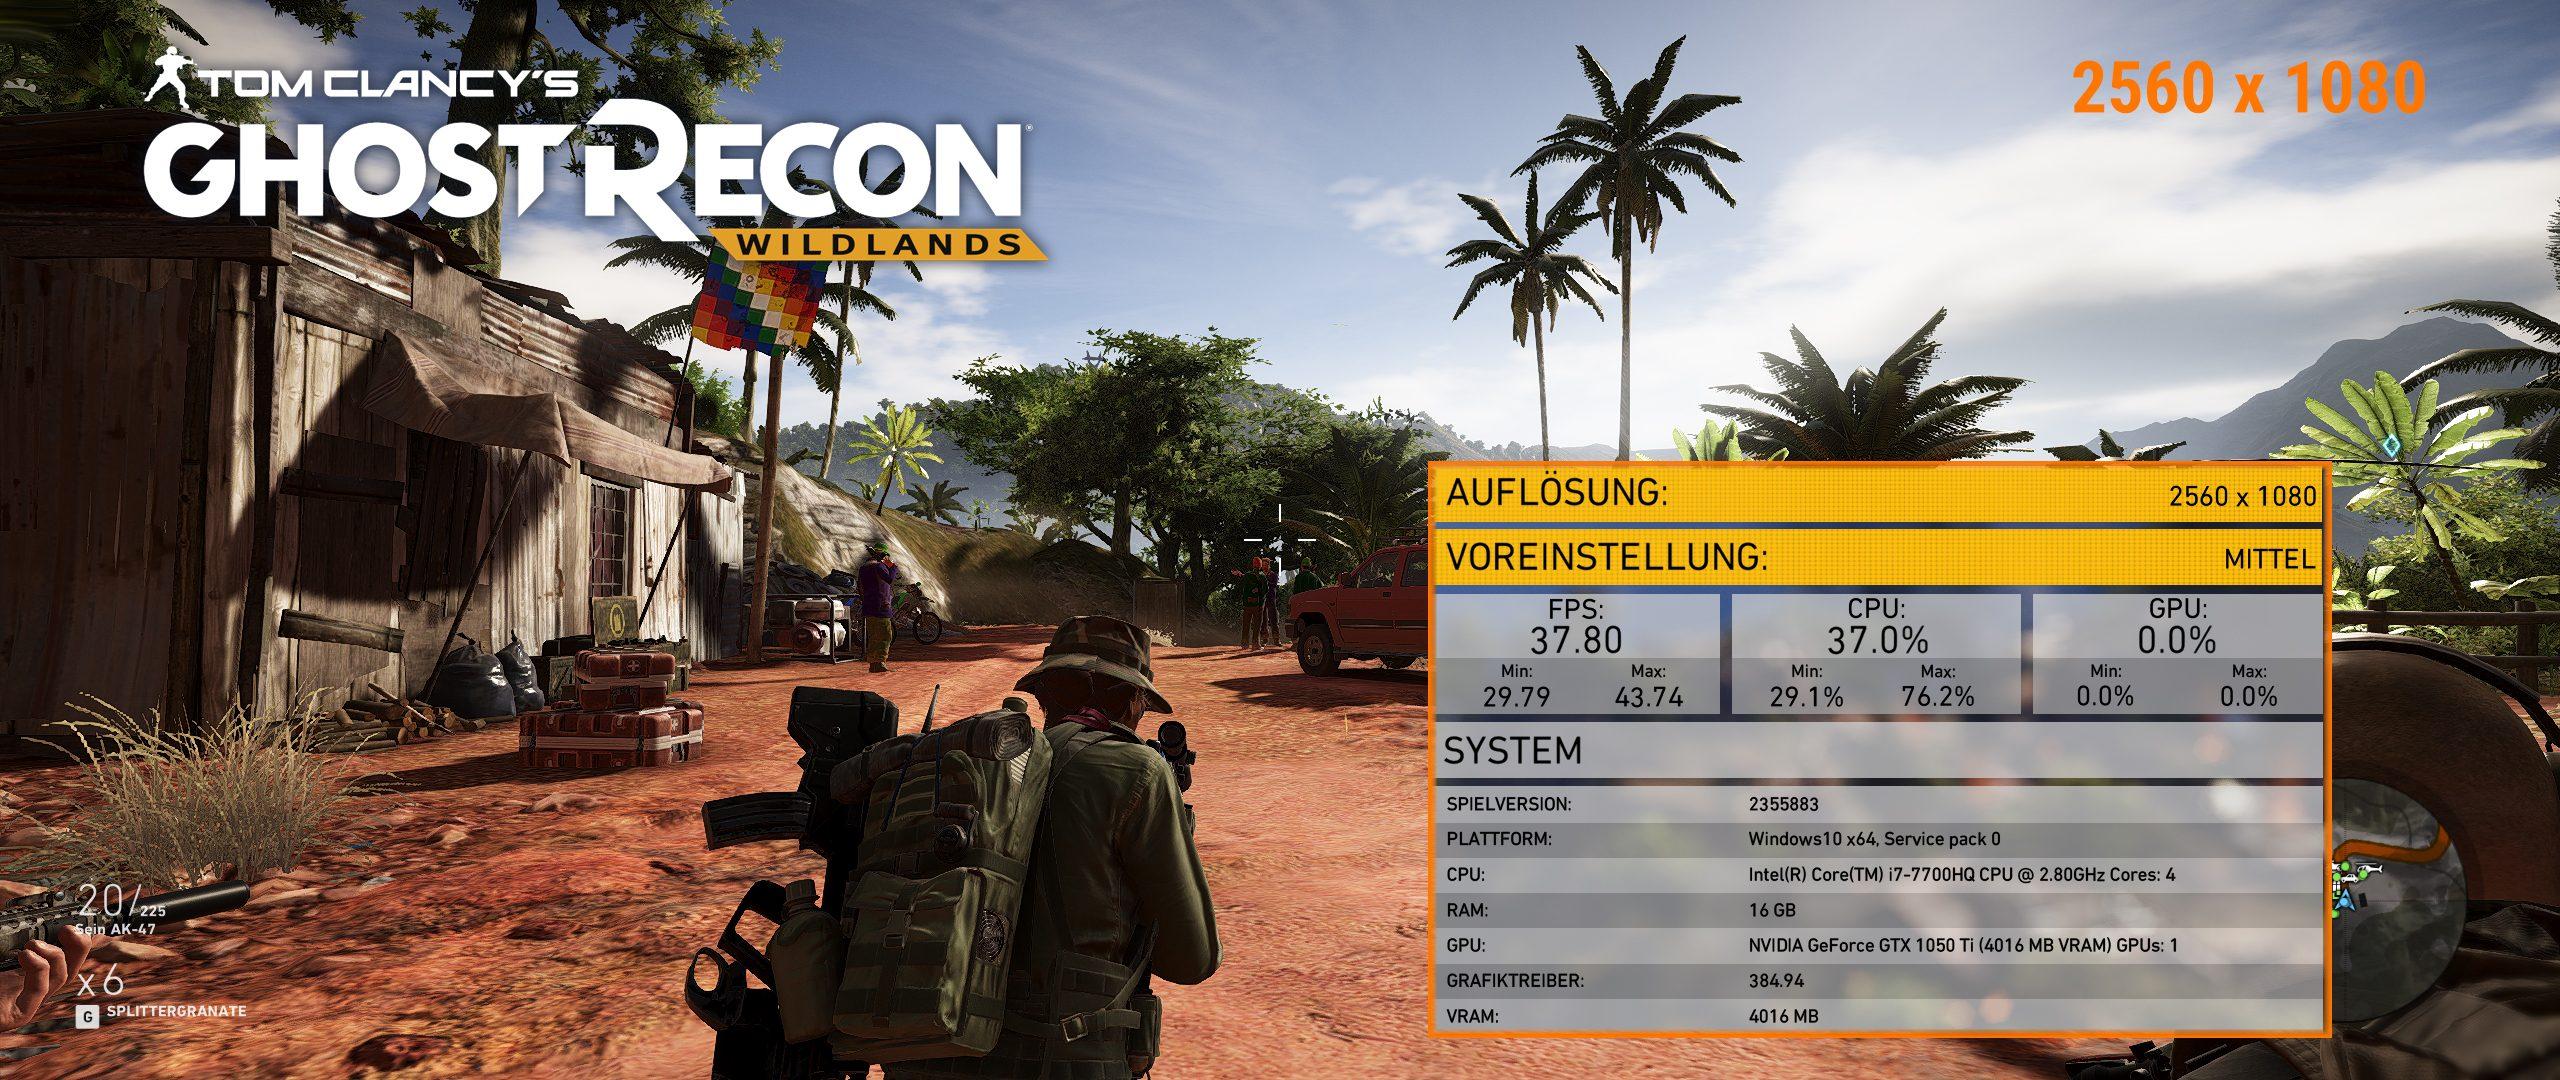 Schenker-XMGA507-NBB-qjz_Games-Monitor_8a